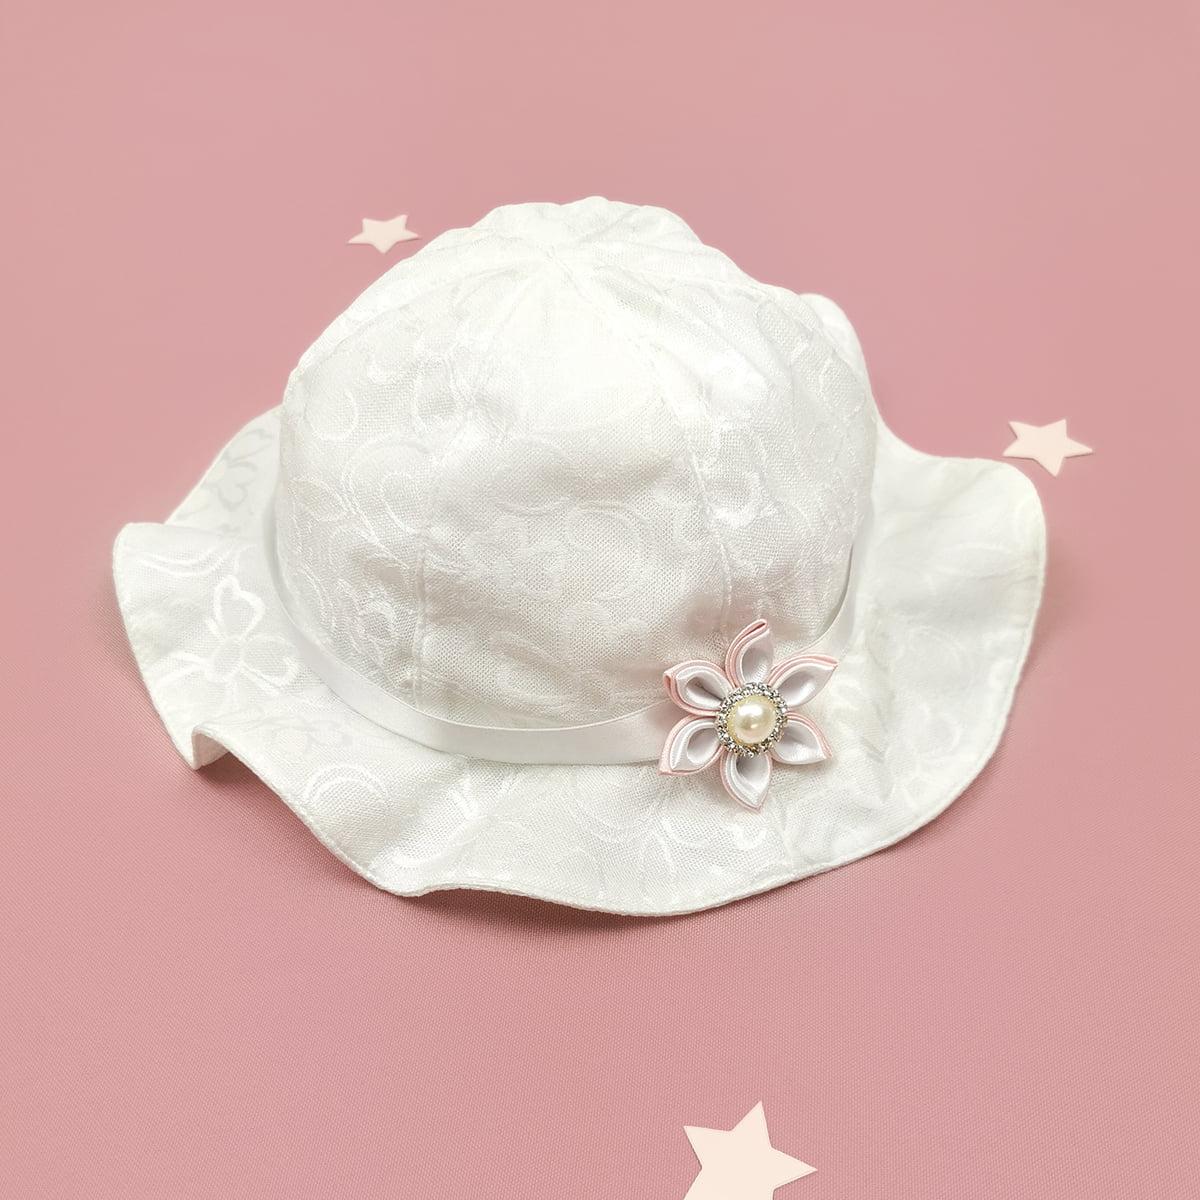 šeširić Morning rose kompletića za krštenje rozi